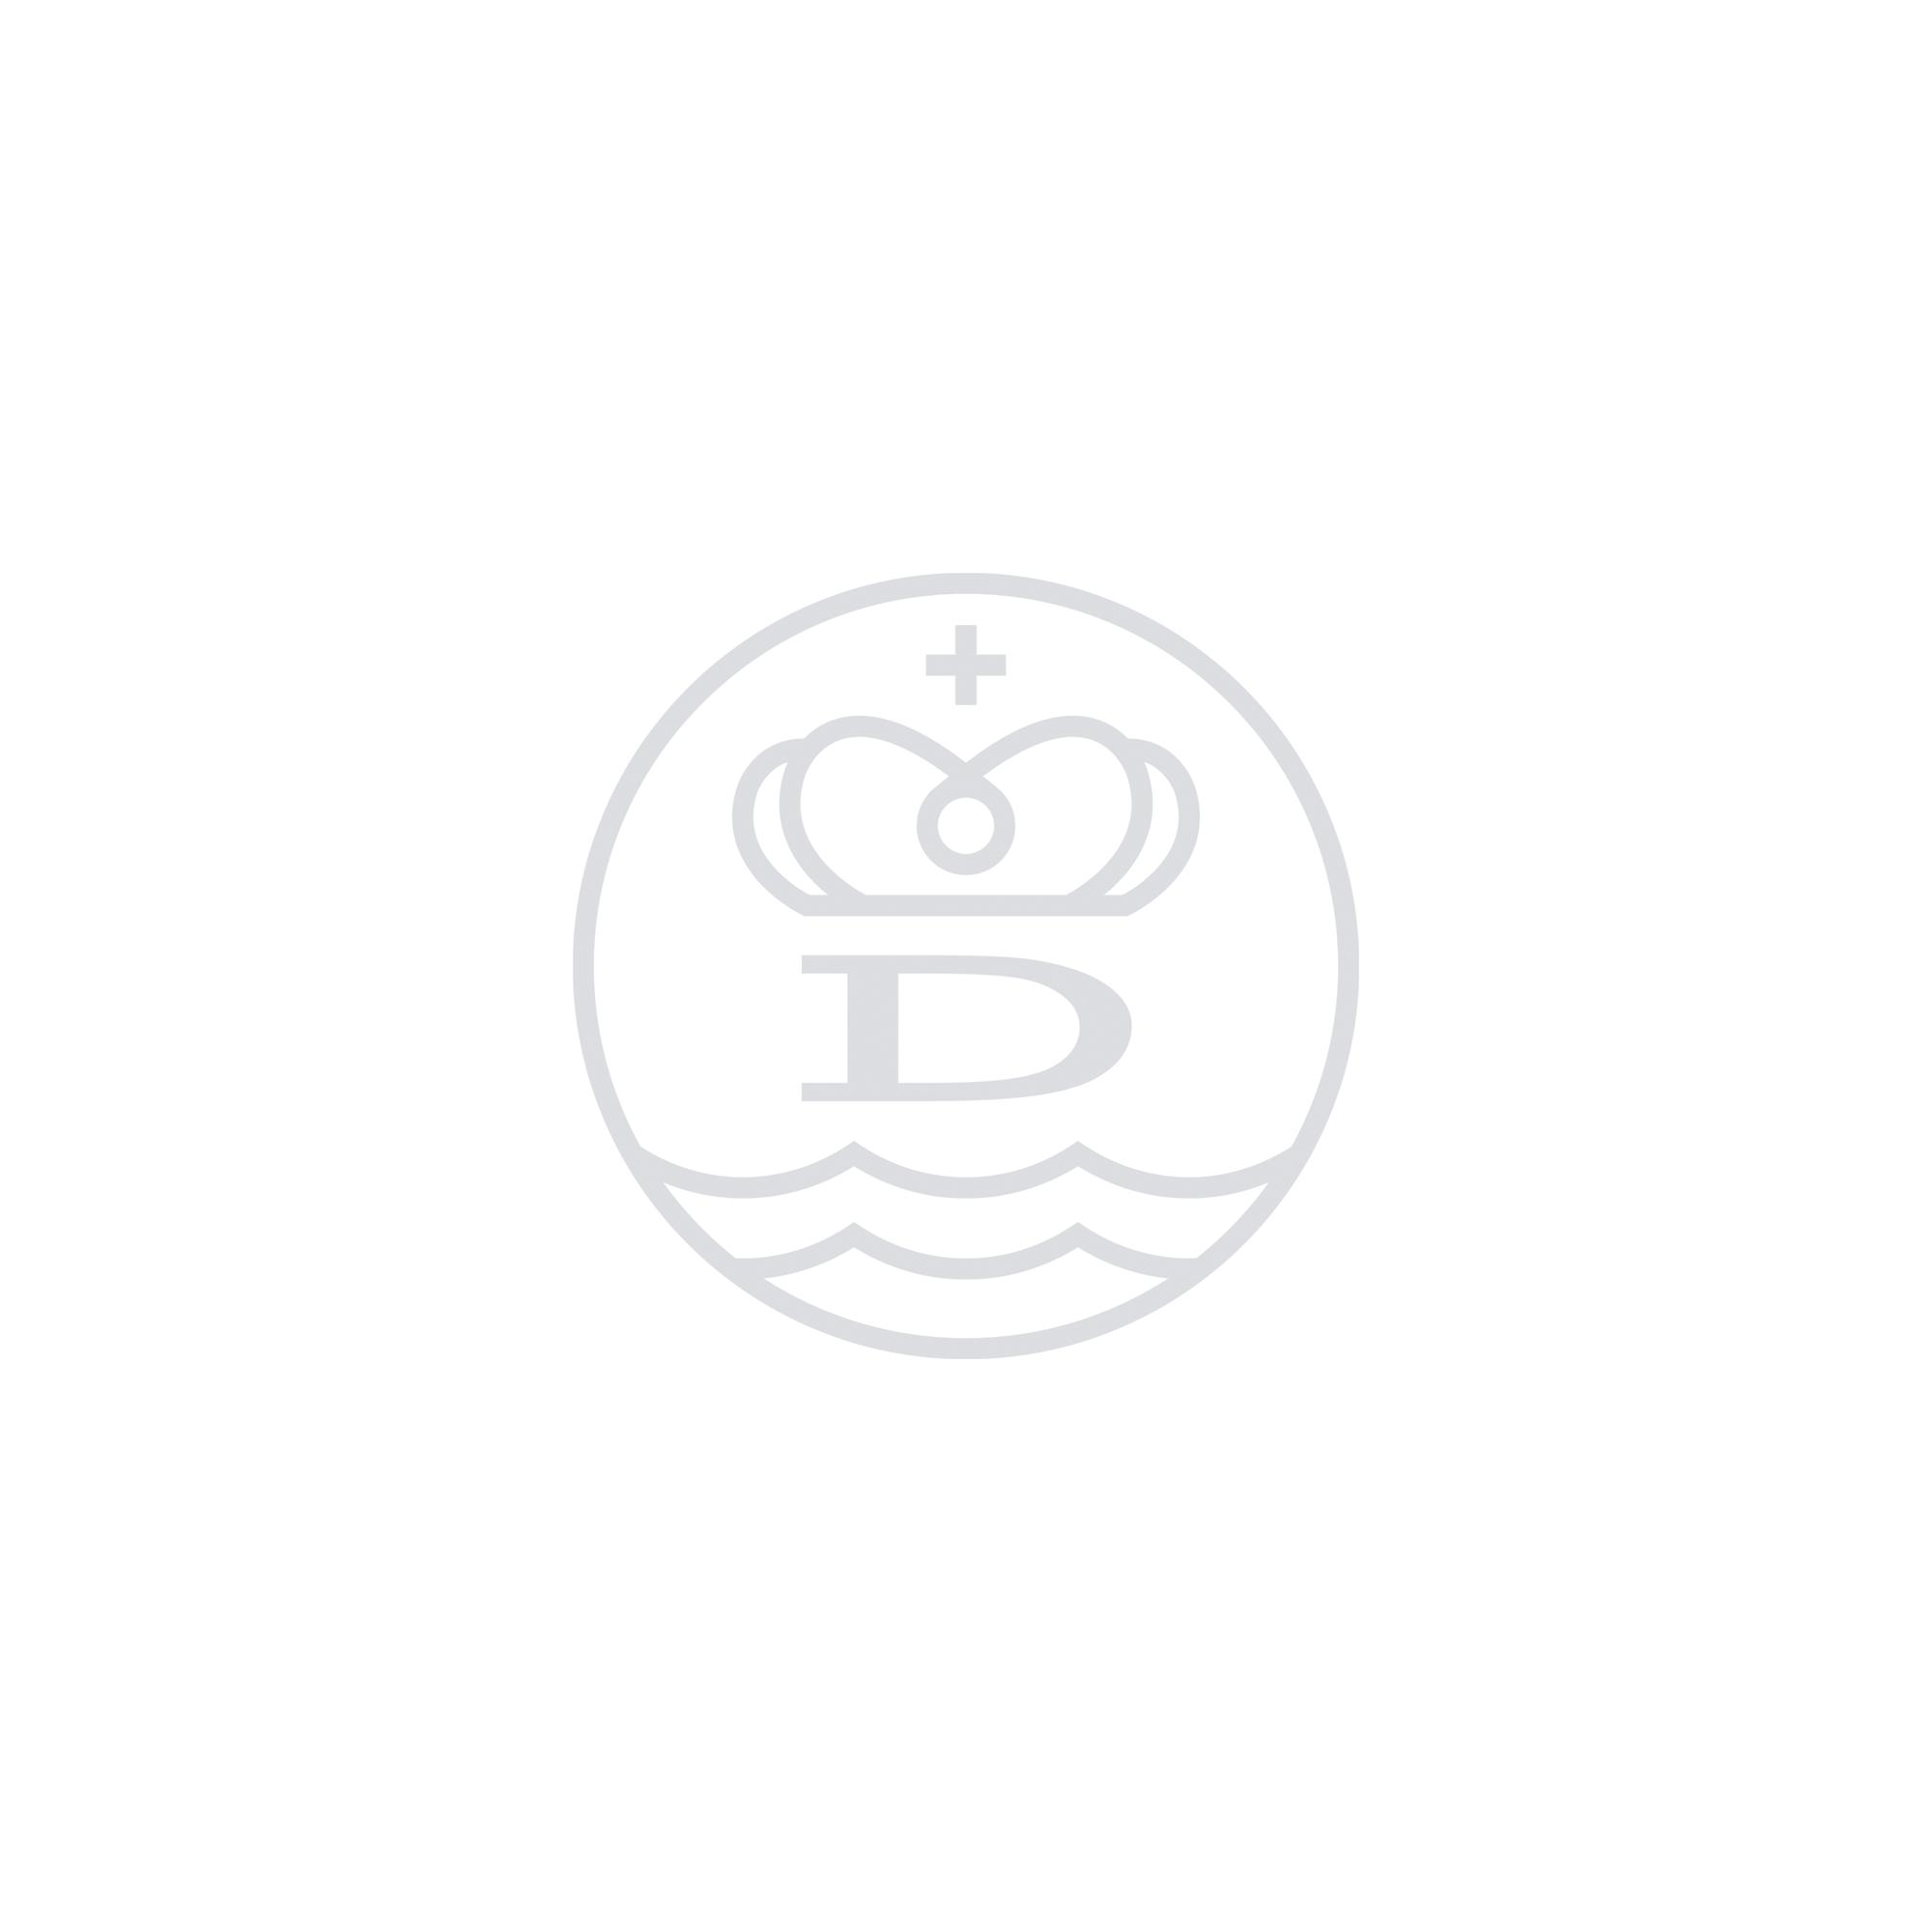 Silver & Gold Medium Bowness Acorn Bangle detailed